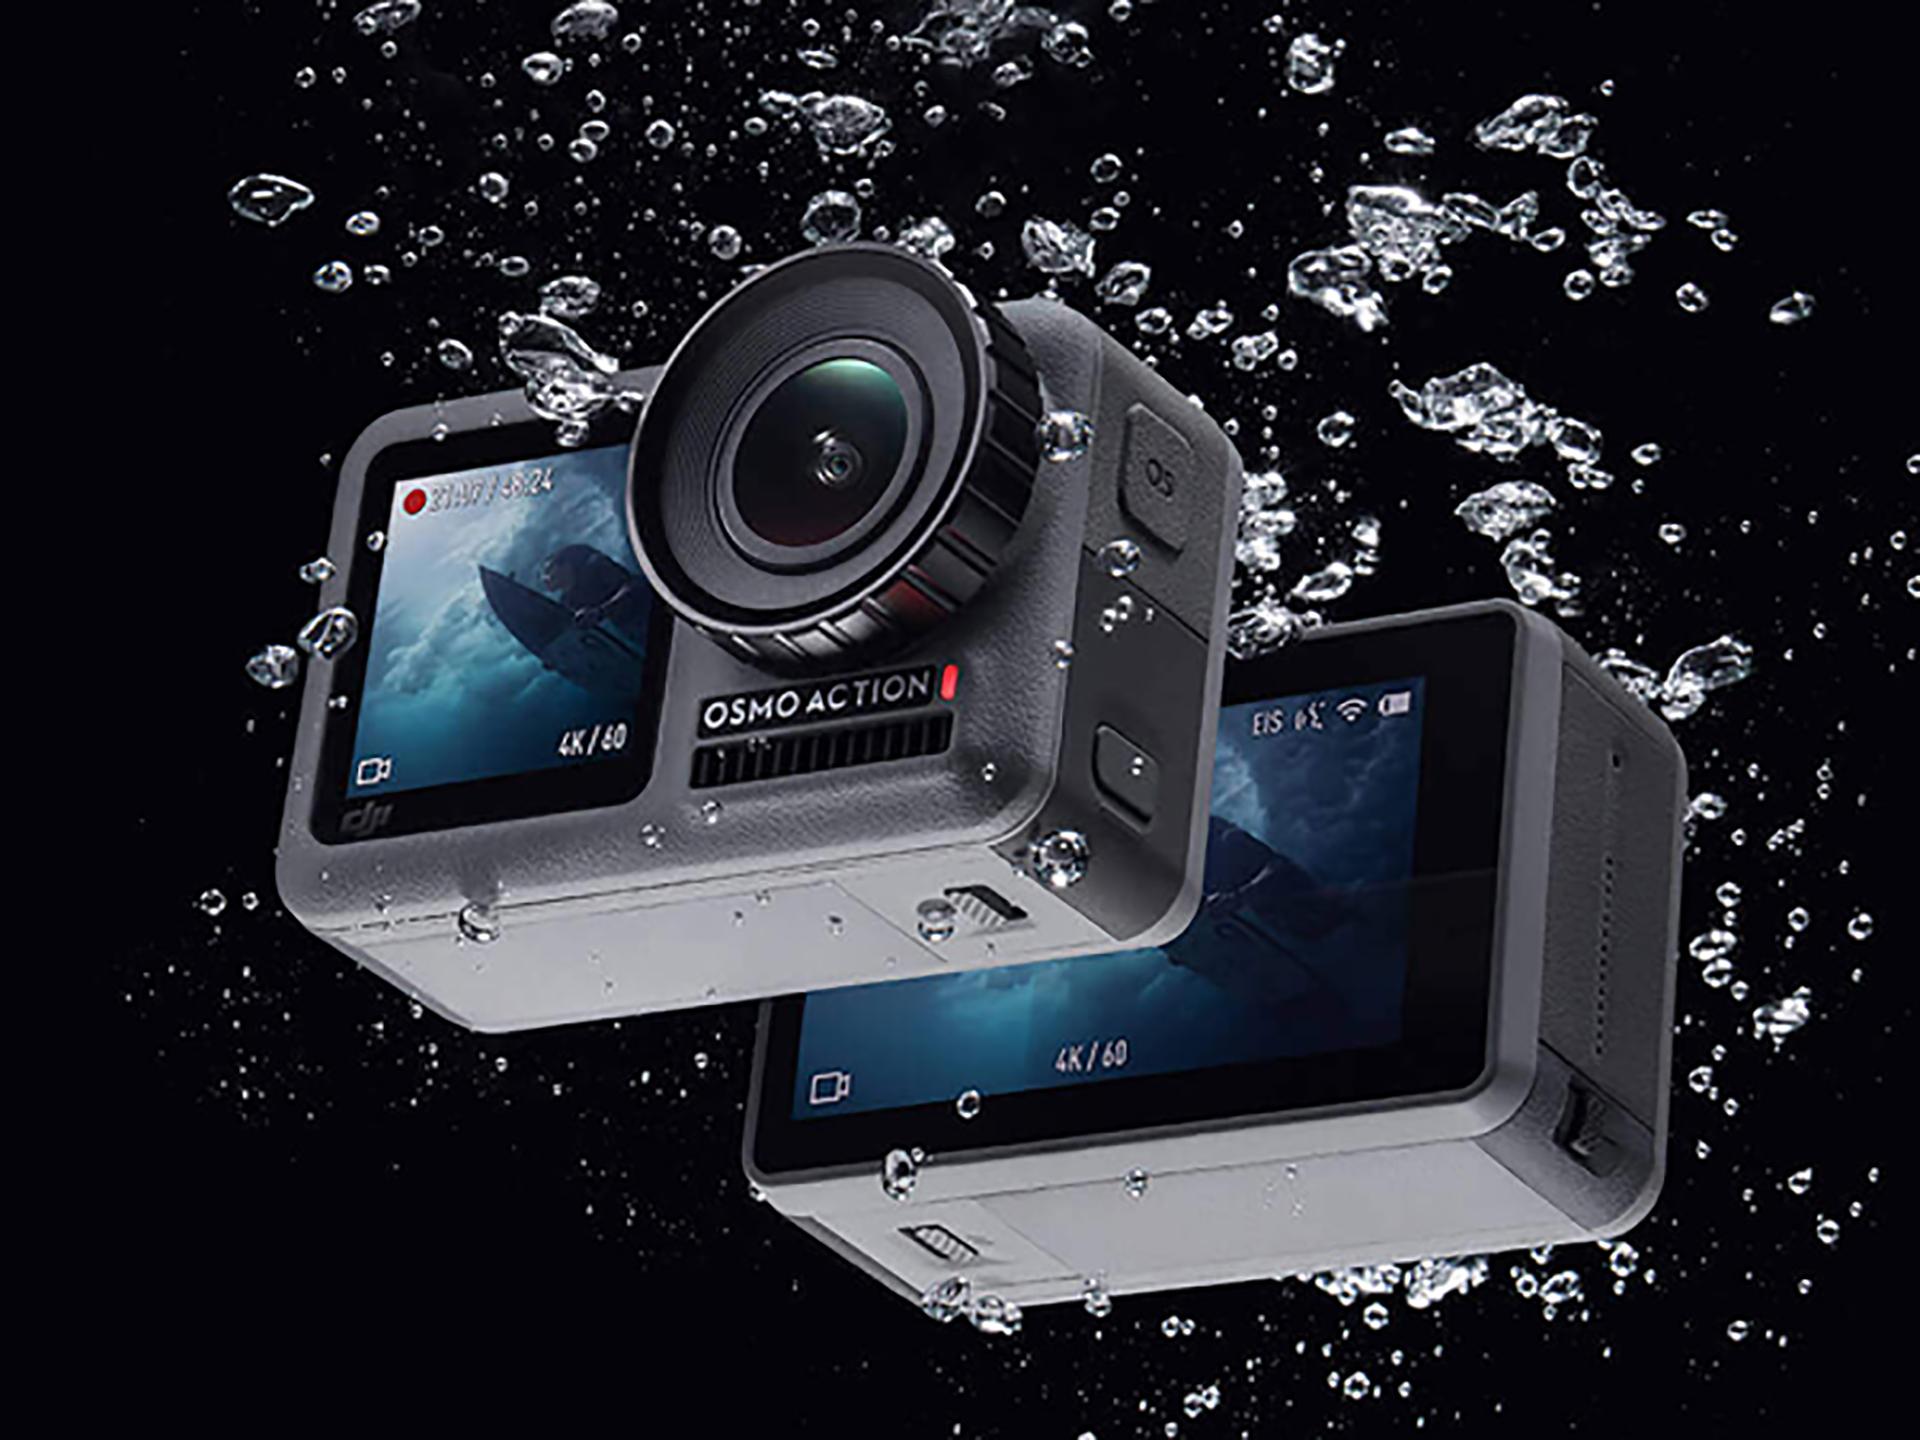 TGC BEACH 2019のセキドの最新アクションカメラ「DJI OSMO ACTION」